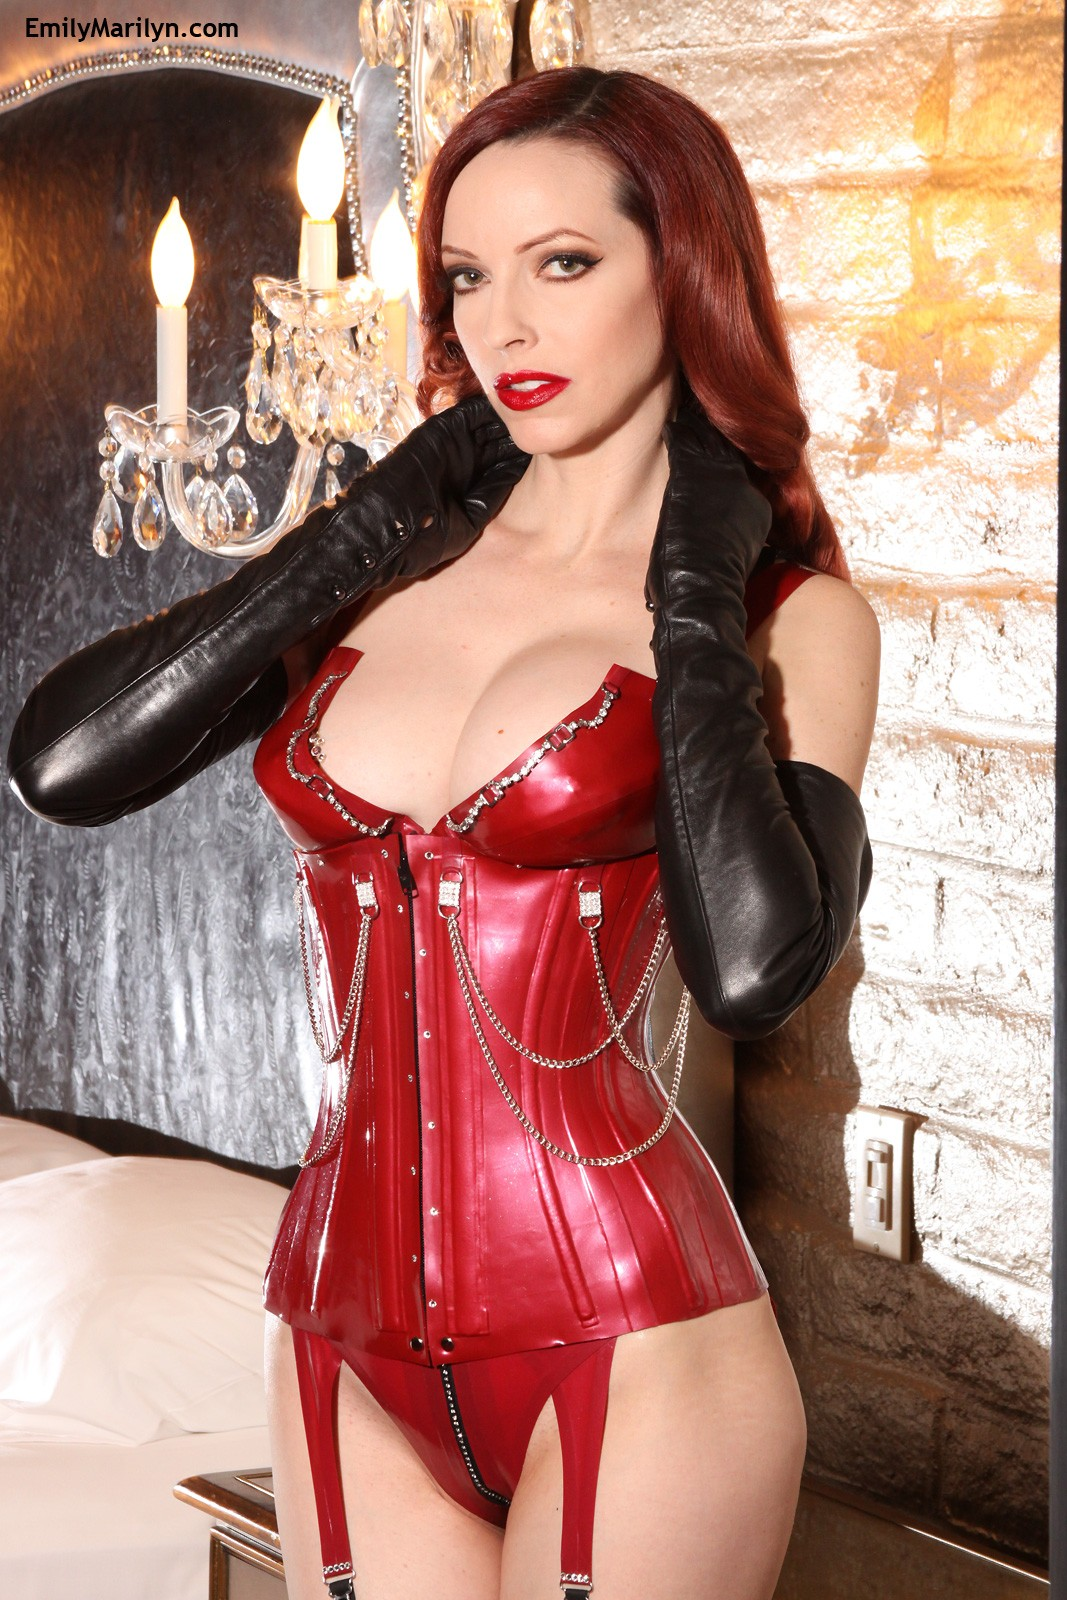 Amusing question corset fetish gallery stocking